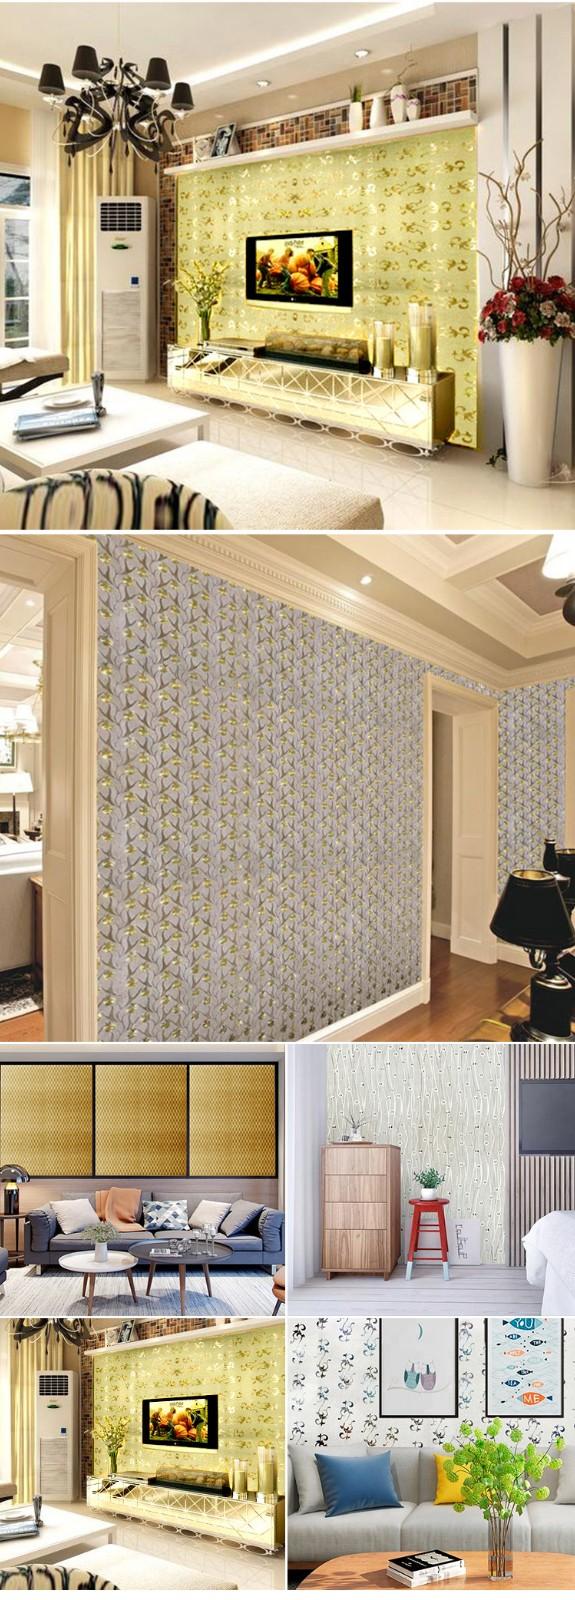 SUNYE best backsplash tile panels wholesale bulk buy-5